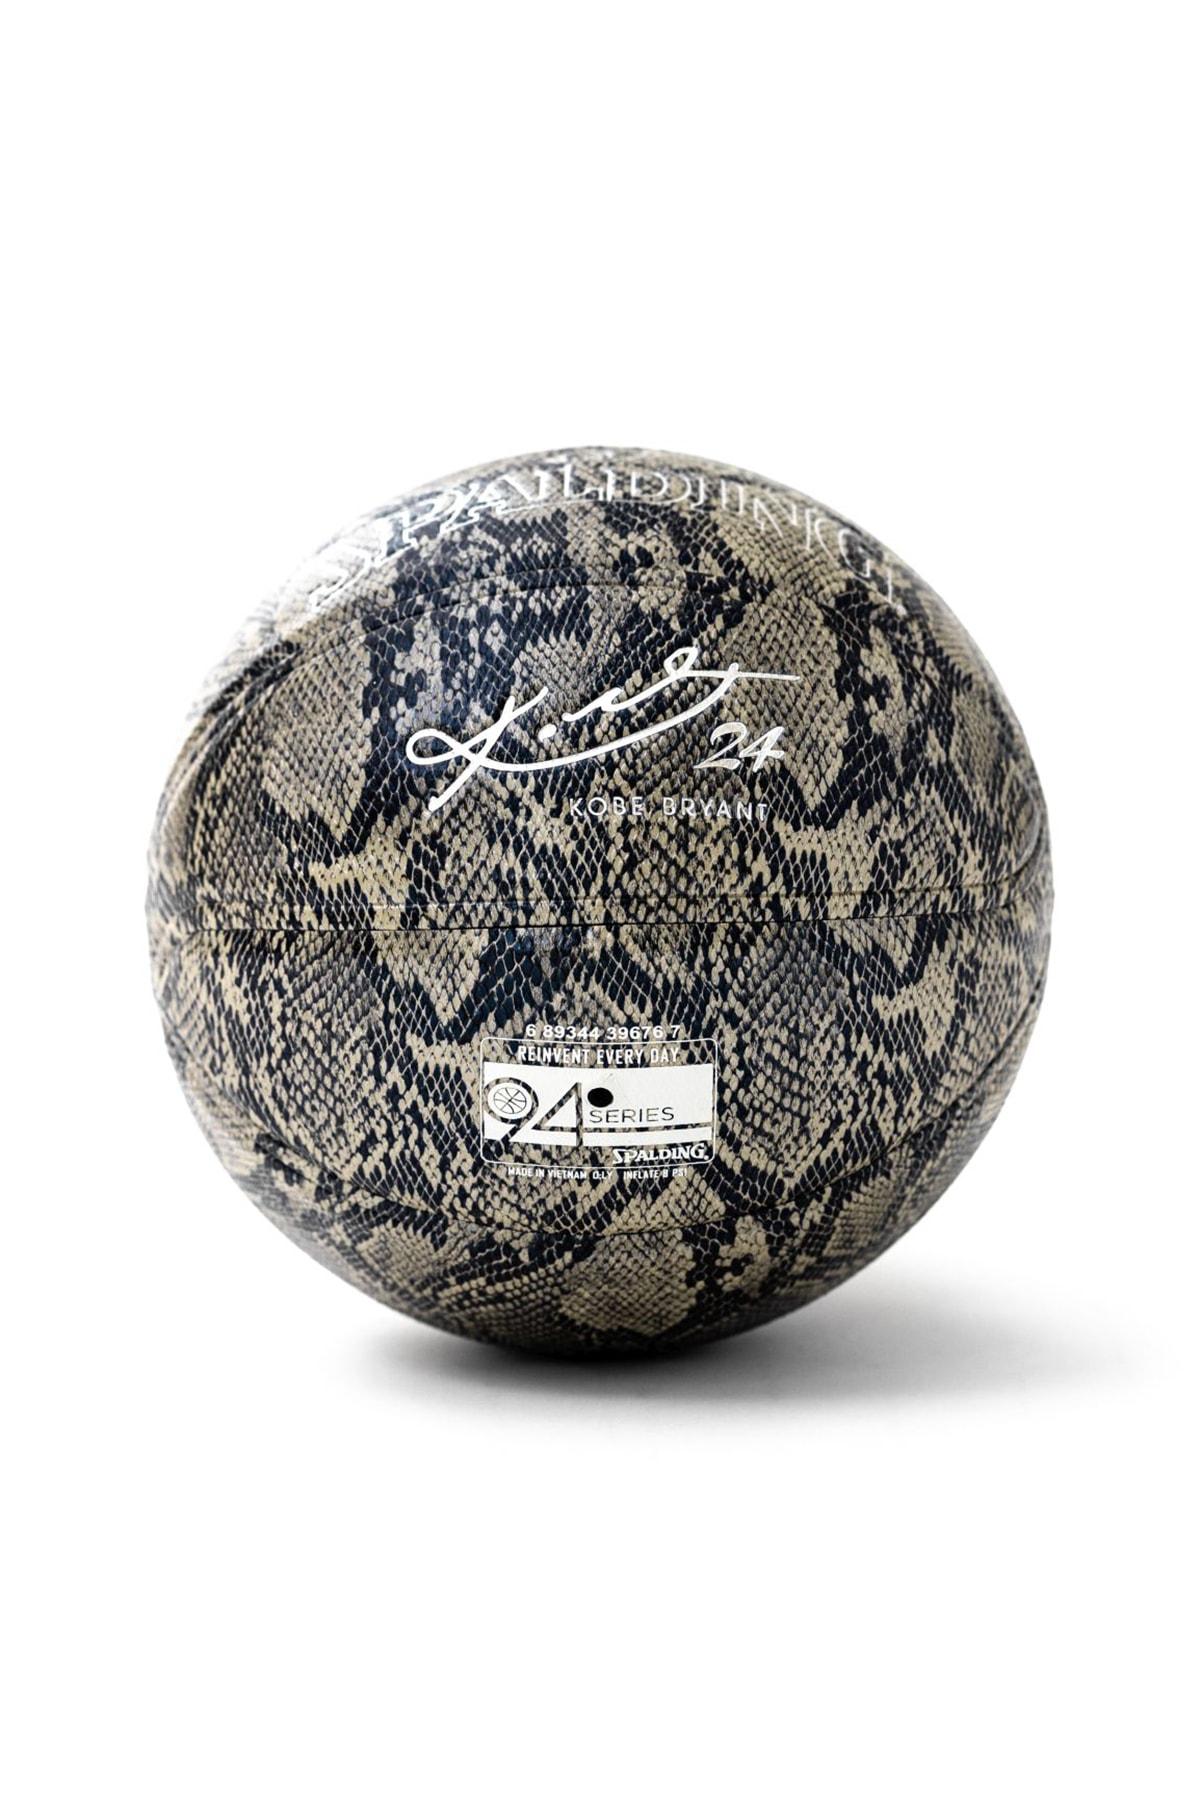 SPALDING Basket Topu 2020 Silver Kobe Bryant Snake 24K SZ7 (76636Z)